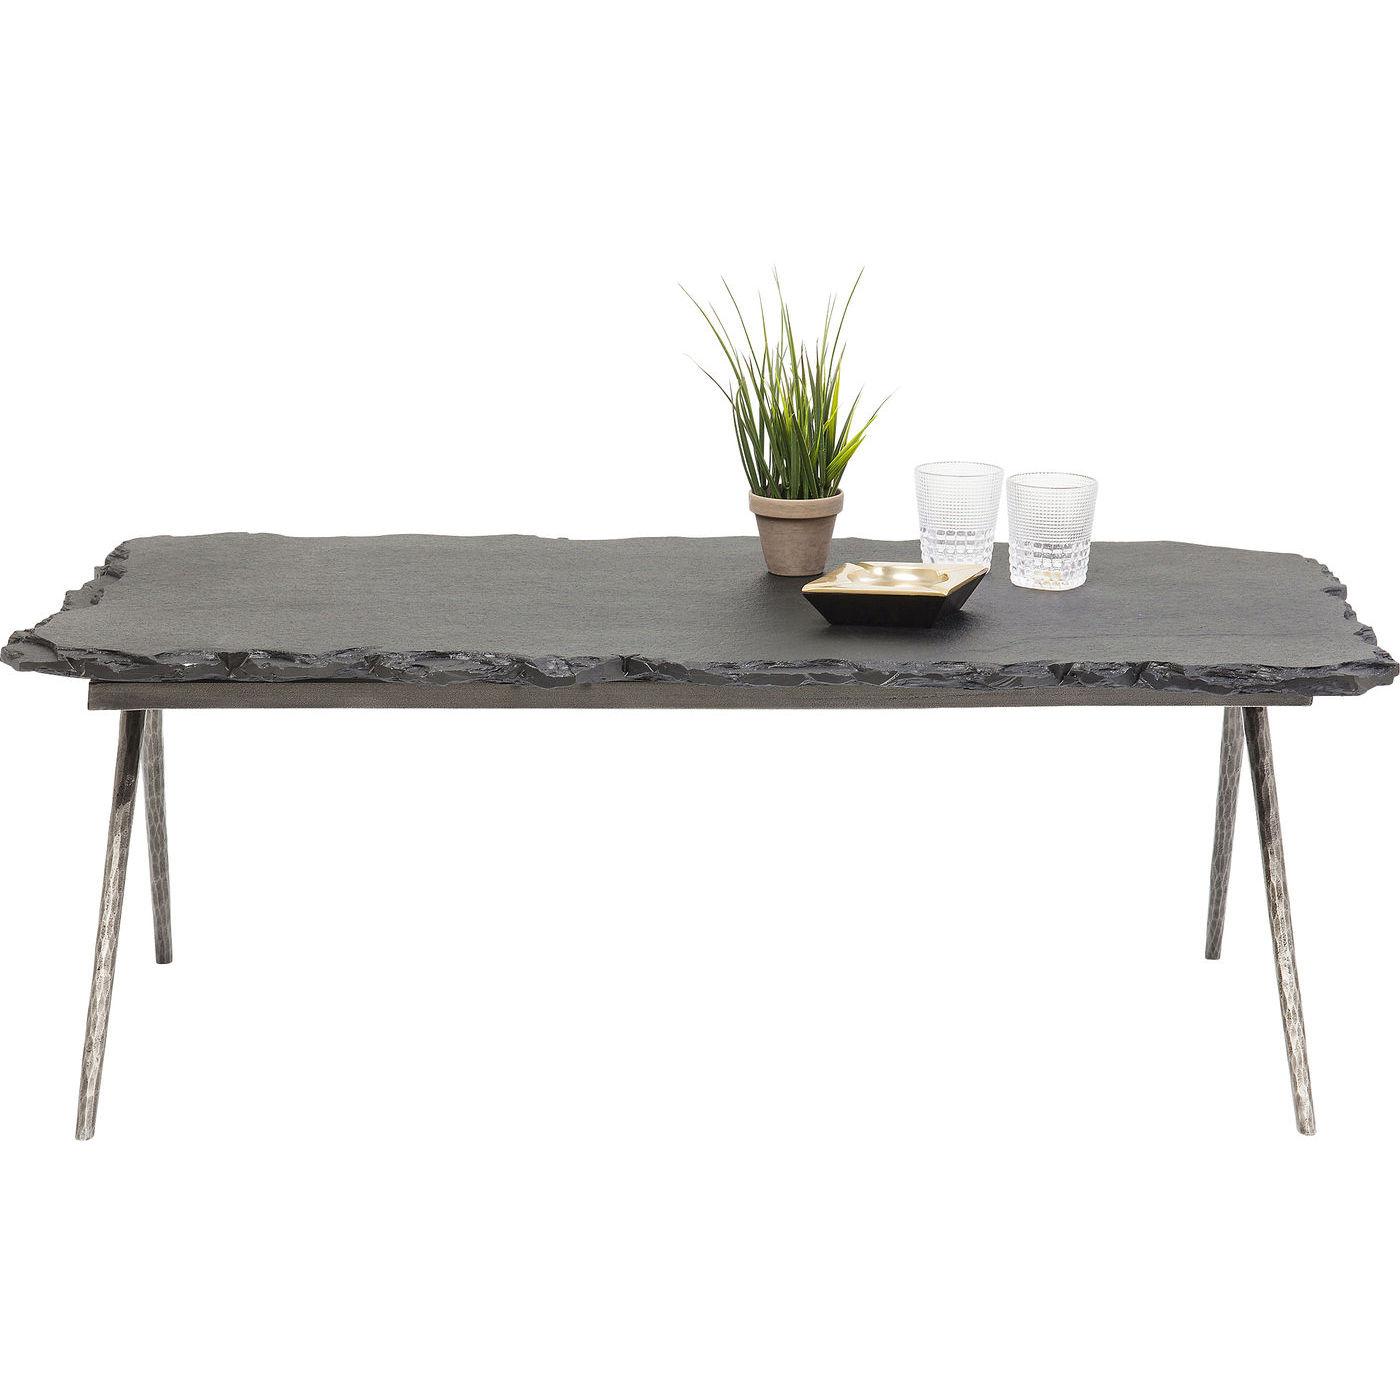 kare design – Kare design pilla stone sofabord - grå/sort sandsten og messing stål (121x61) på boboonline.dk